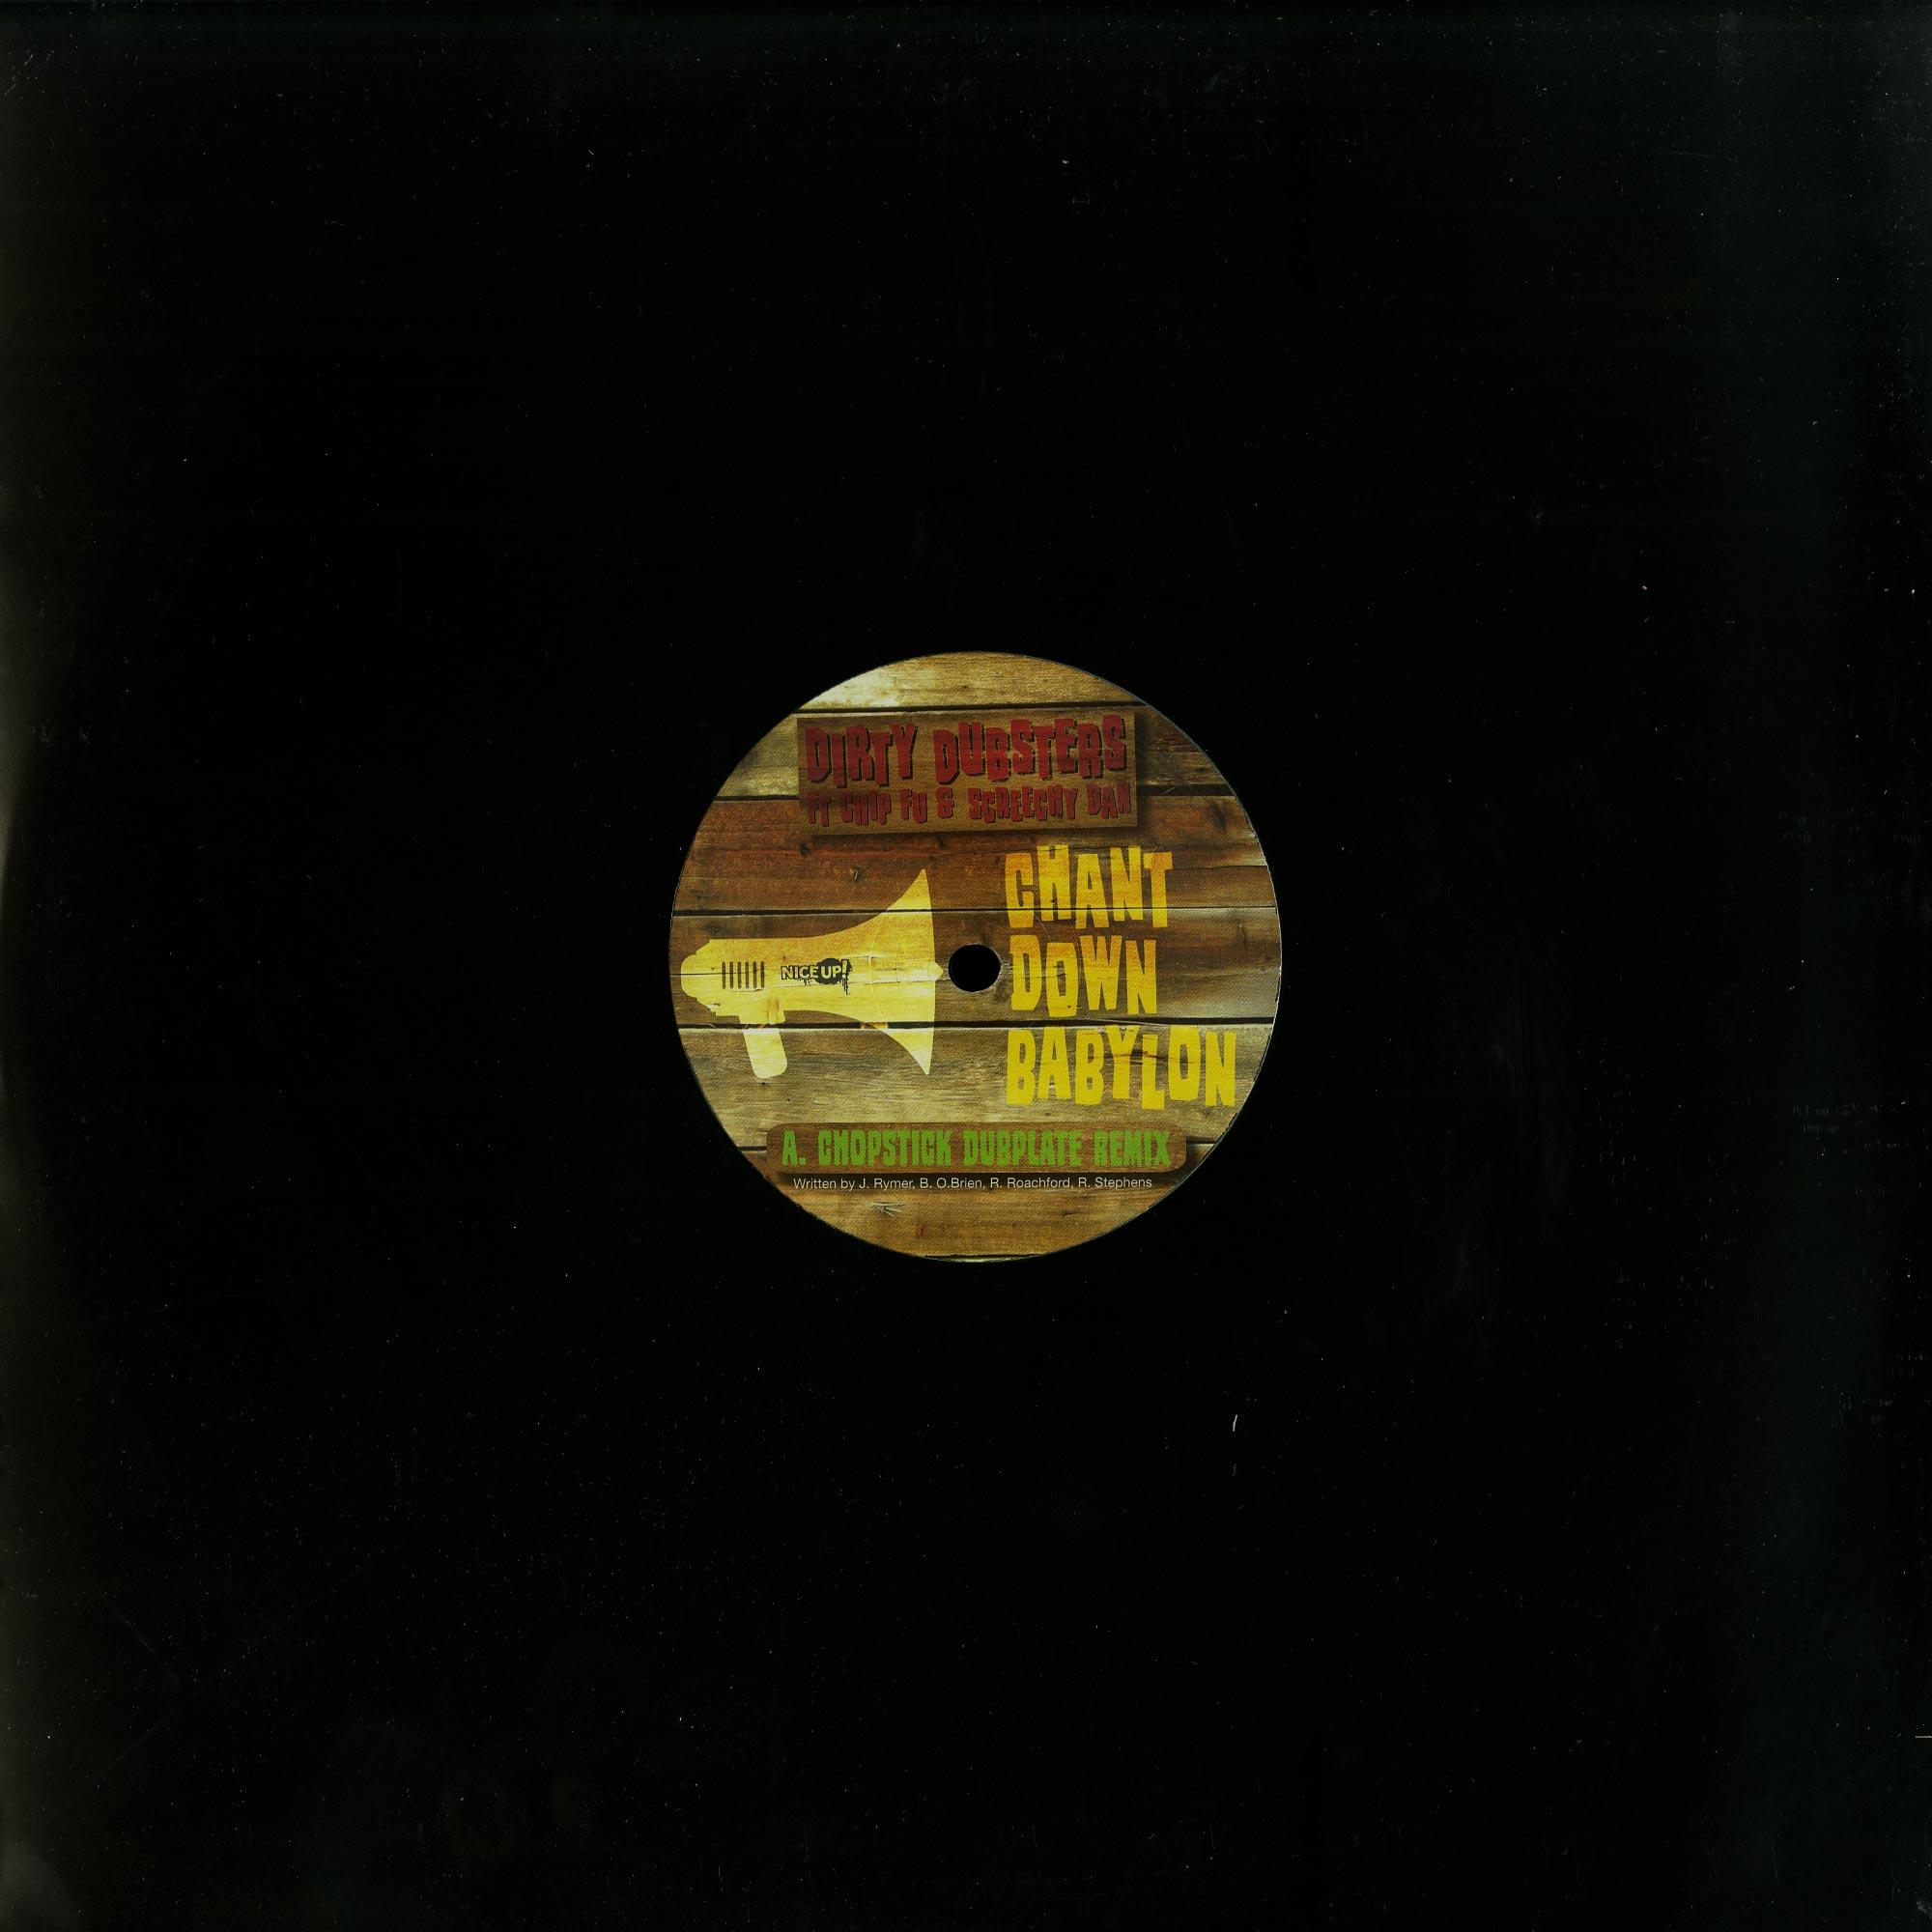 Dirty Dubsters ft. Chip Fu & Screechy Dan - CHANT DOWN BABYLON